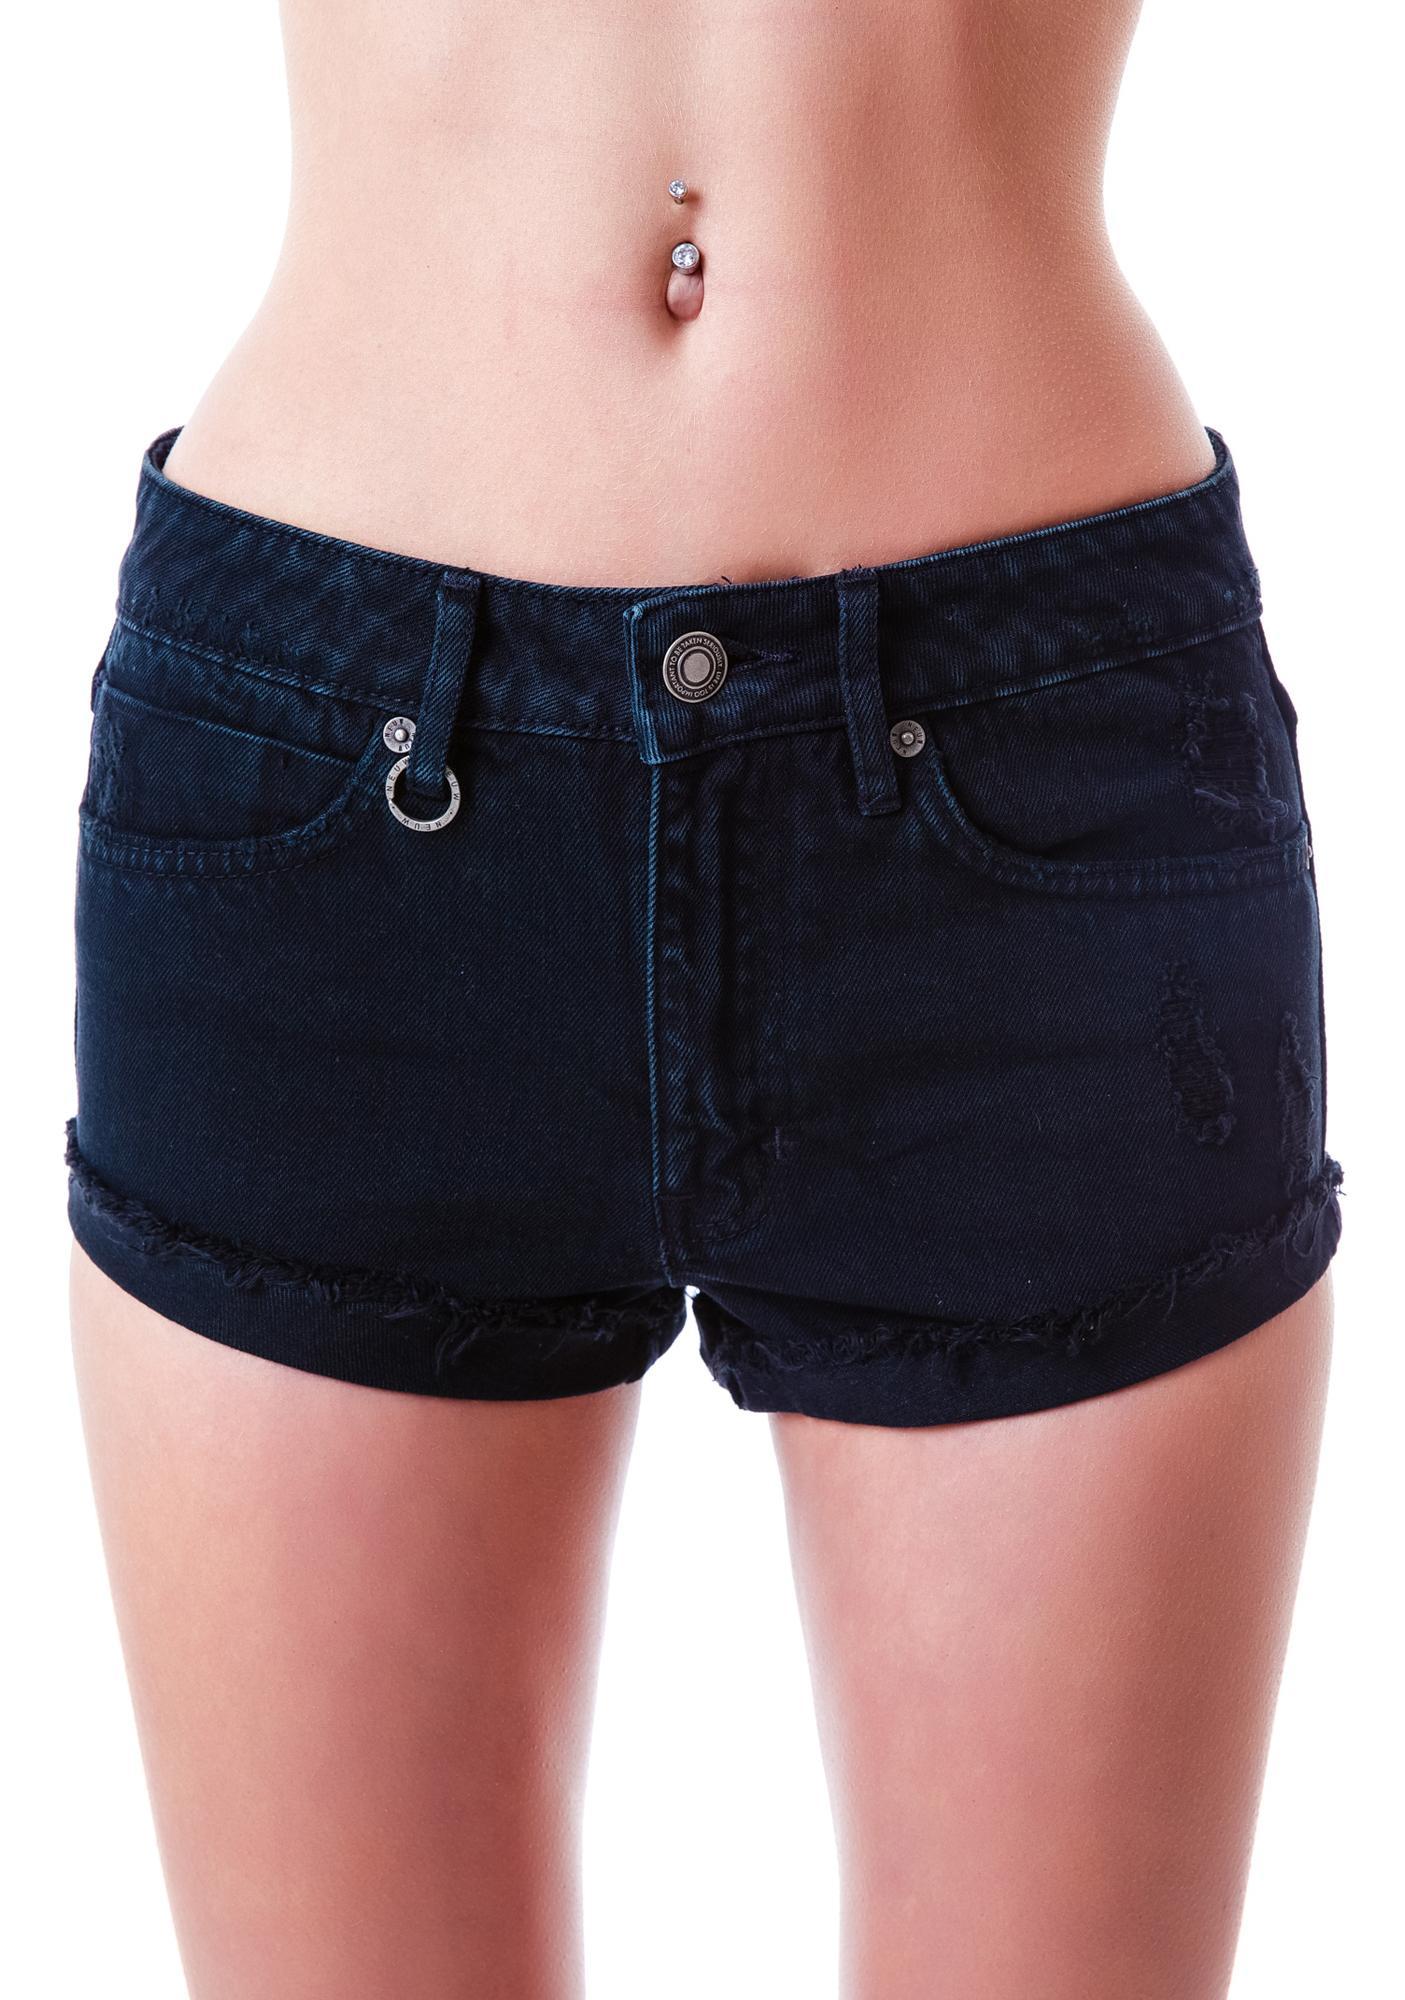 Neuw Vintage Cheeky Shorts